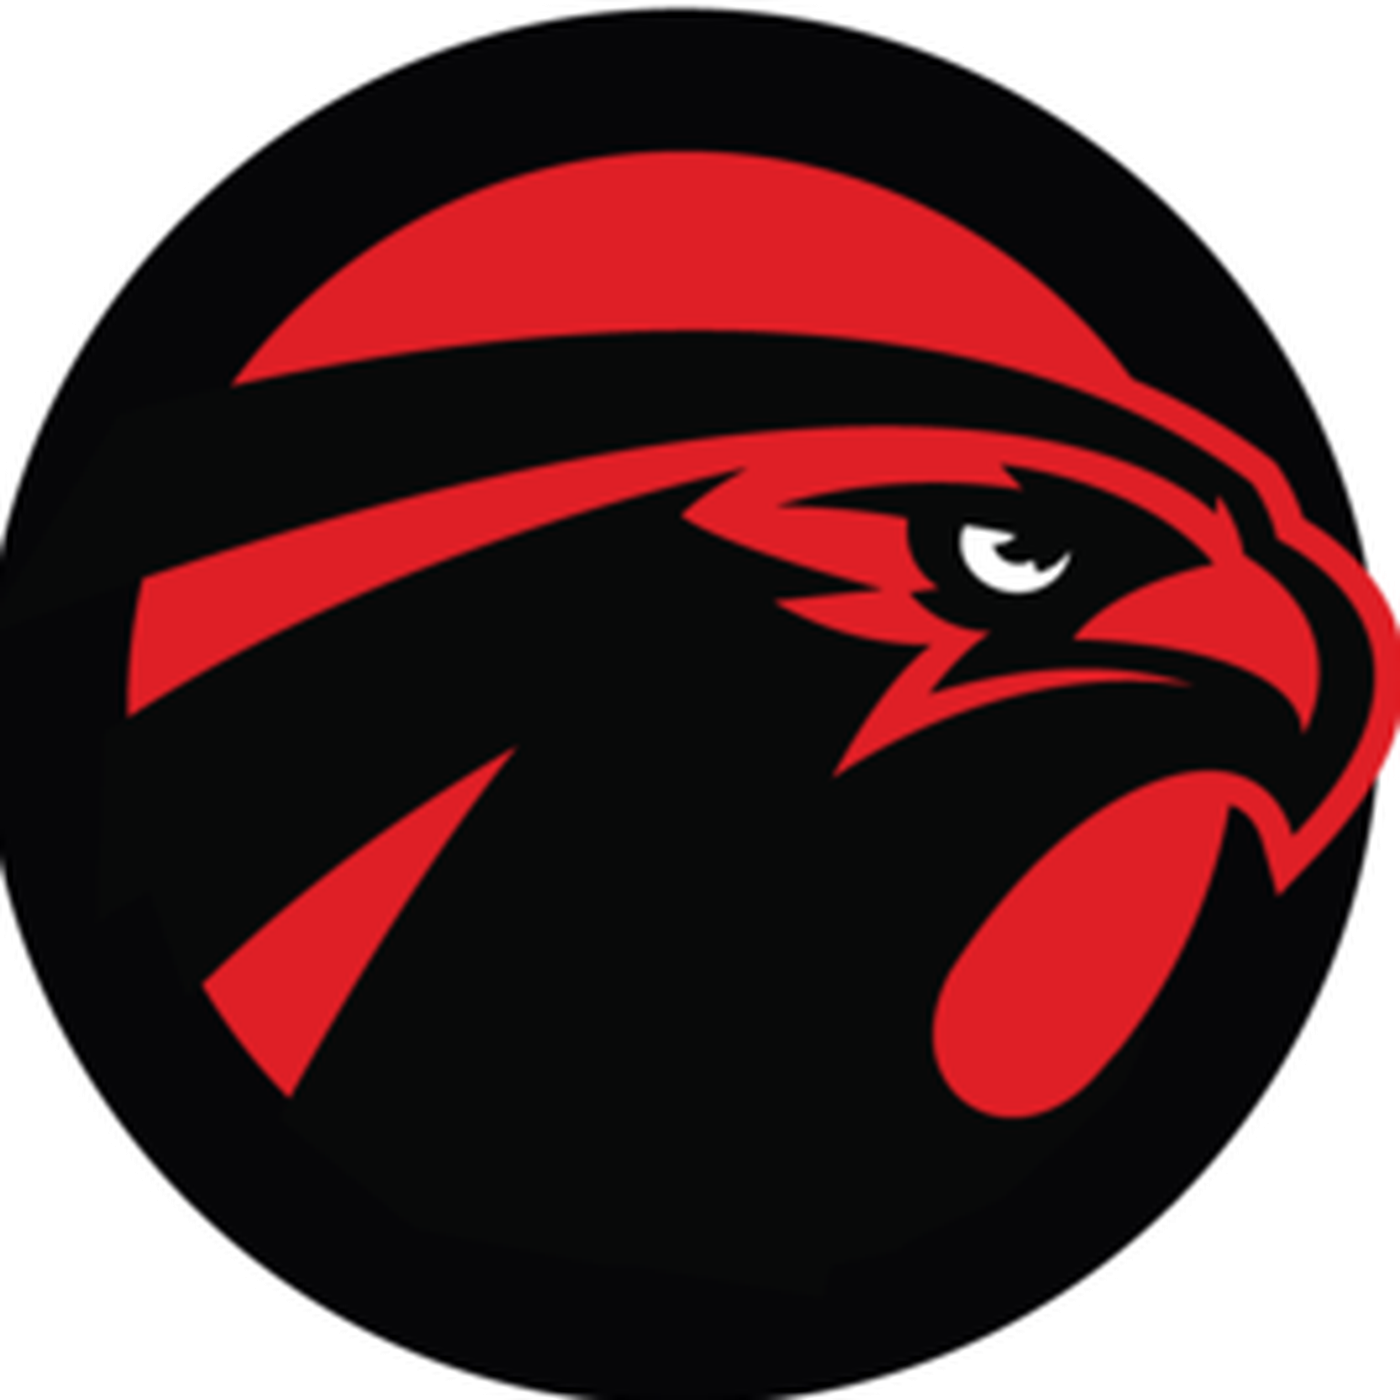 Atlanta falcons football clipart png black and white Atlanta Falcons Facts - The Falcoholic png black and white